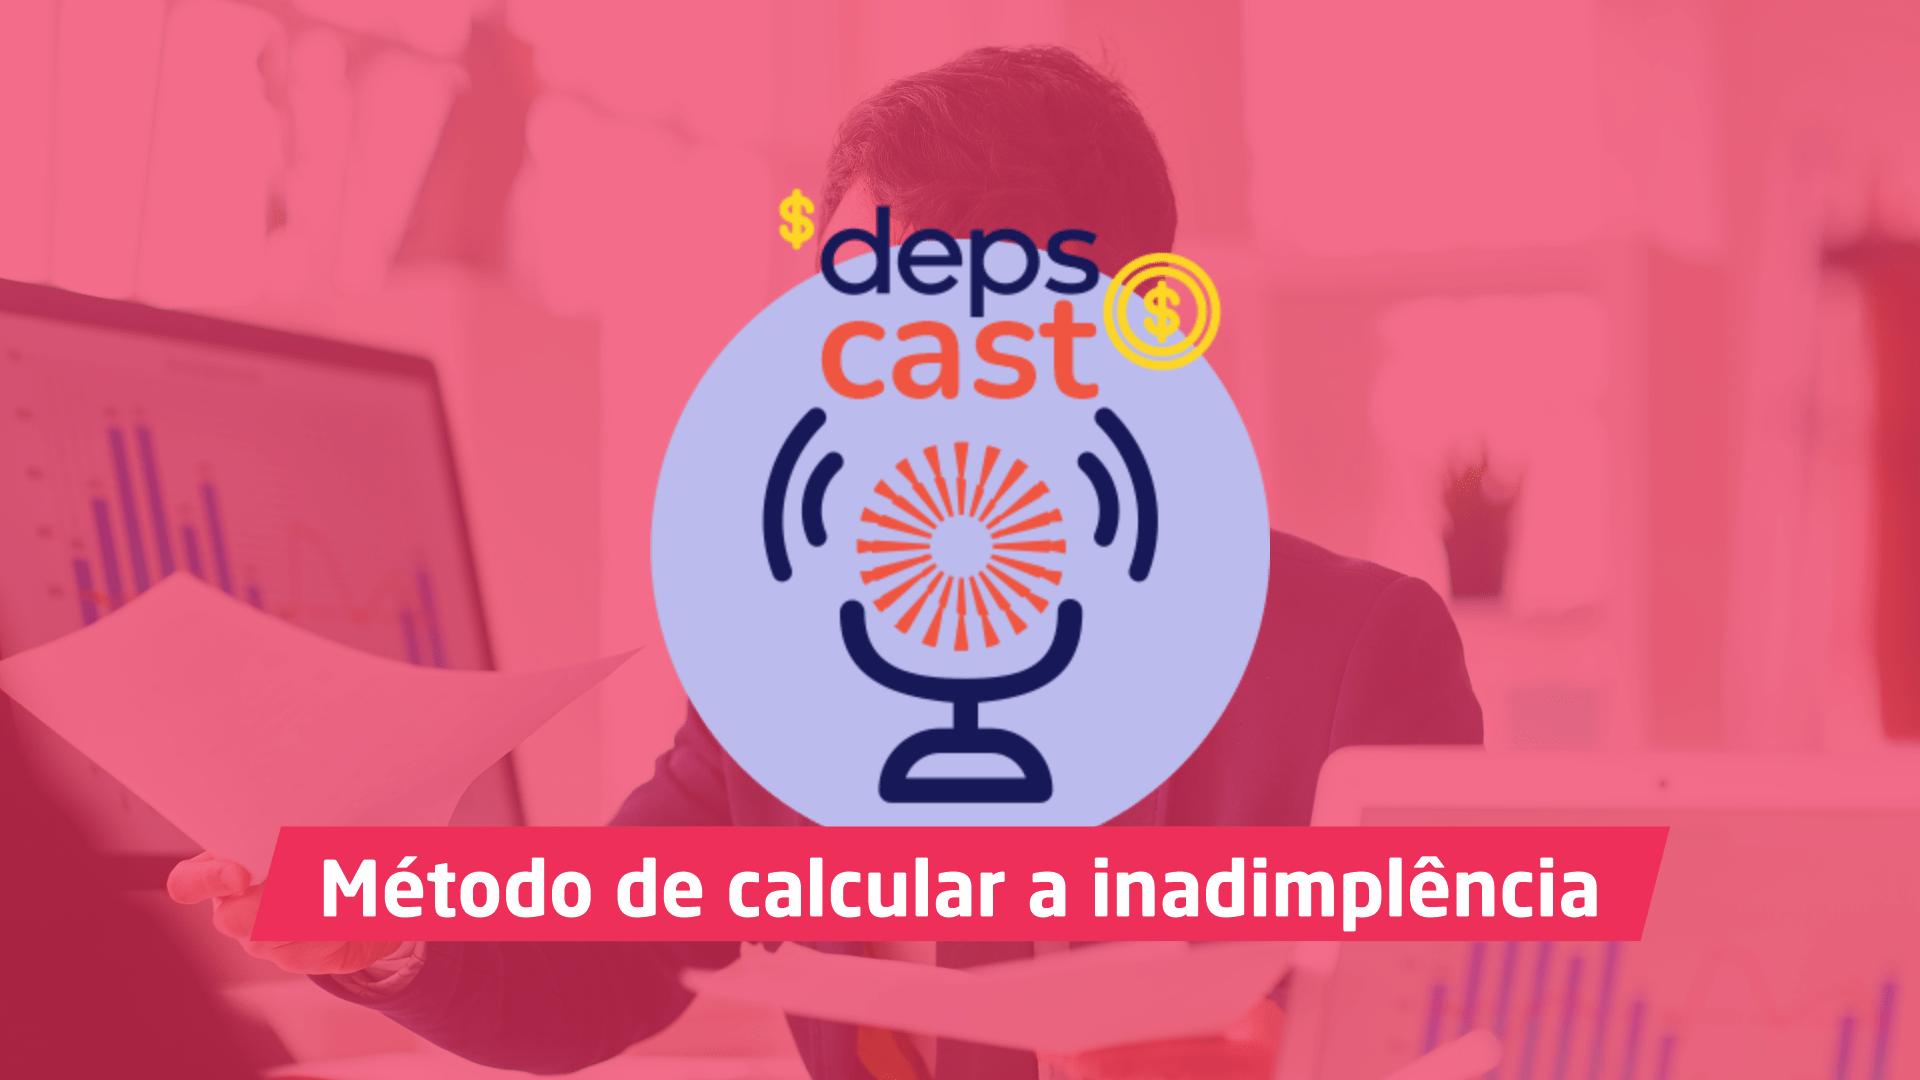 DepsCast 6 Método de calcular a inadimplência